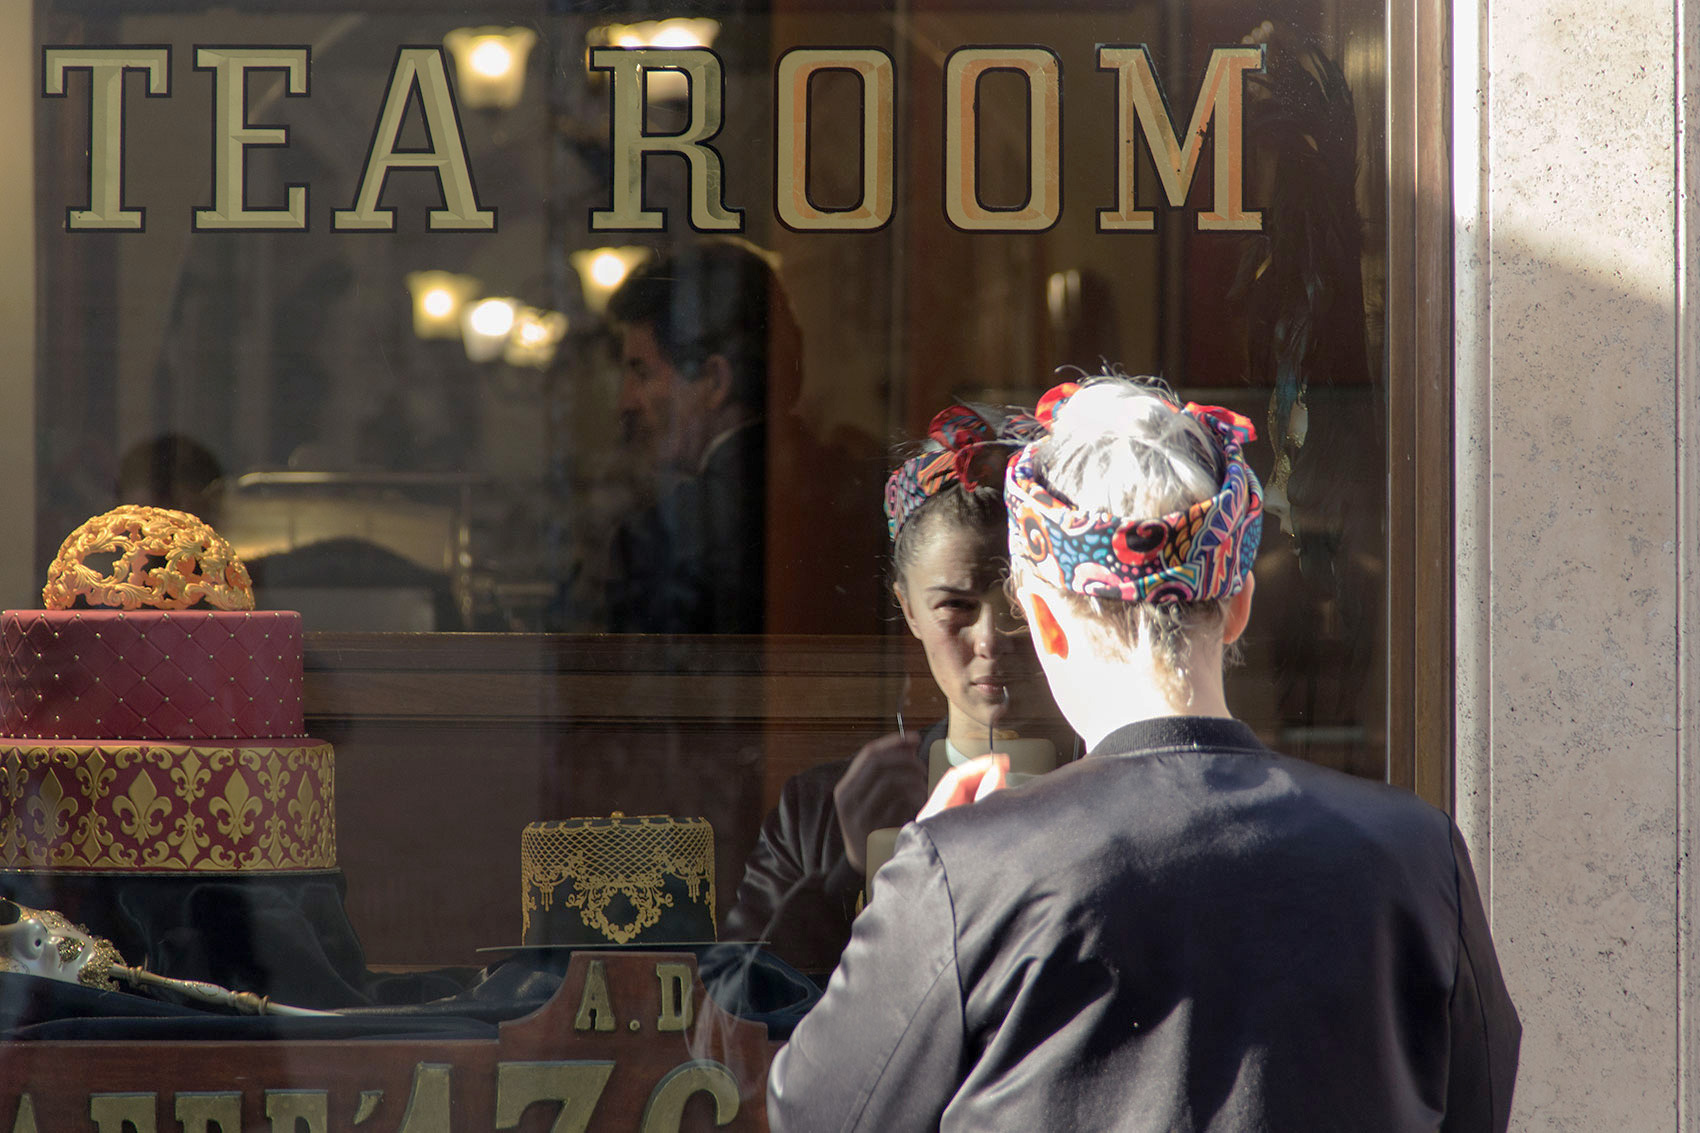 A girl mirrored in the Caffè Greco window